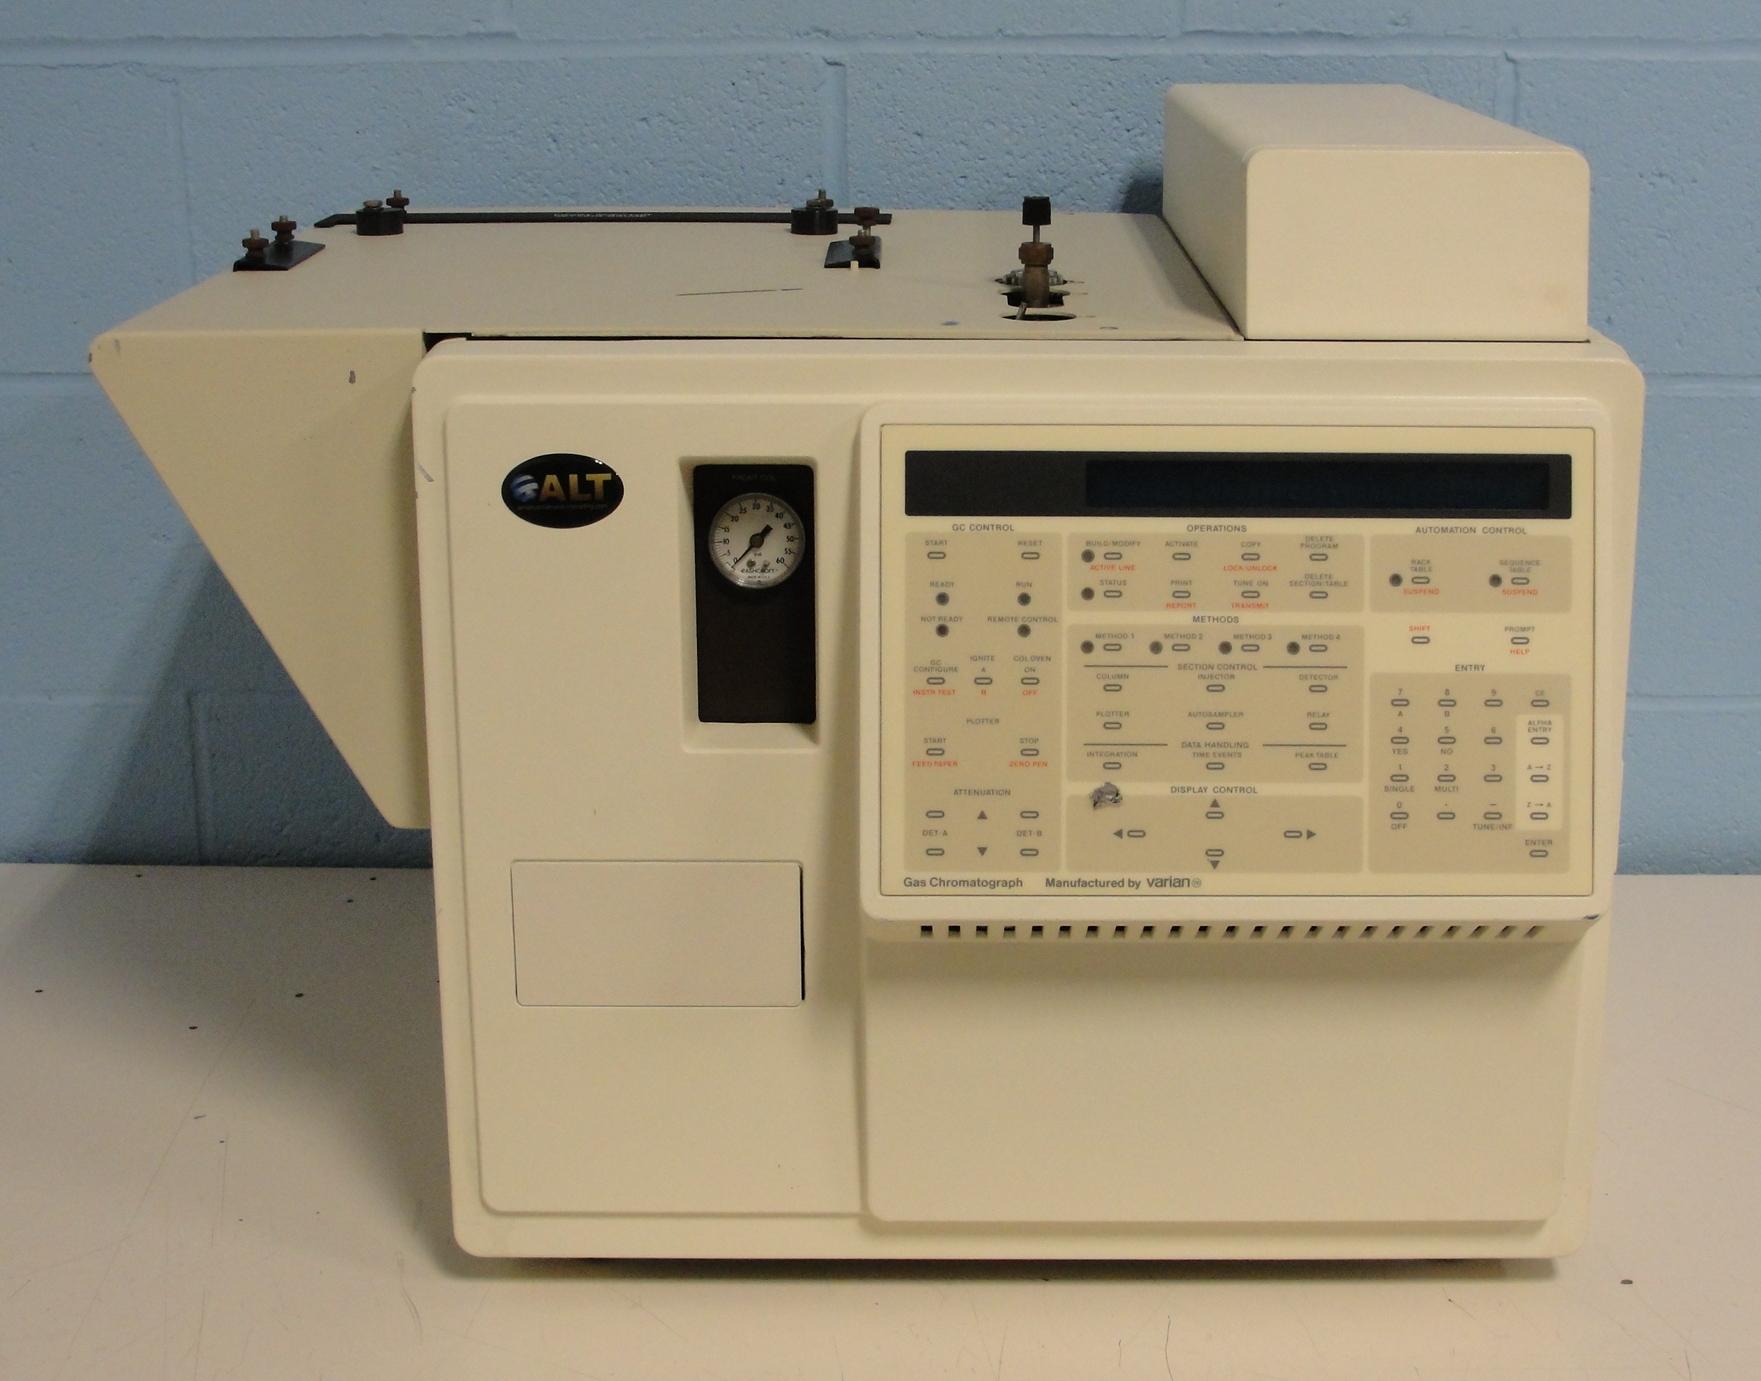 Varian 3400 Gas Chromatograph Image